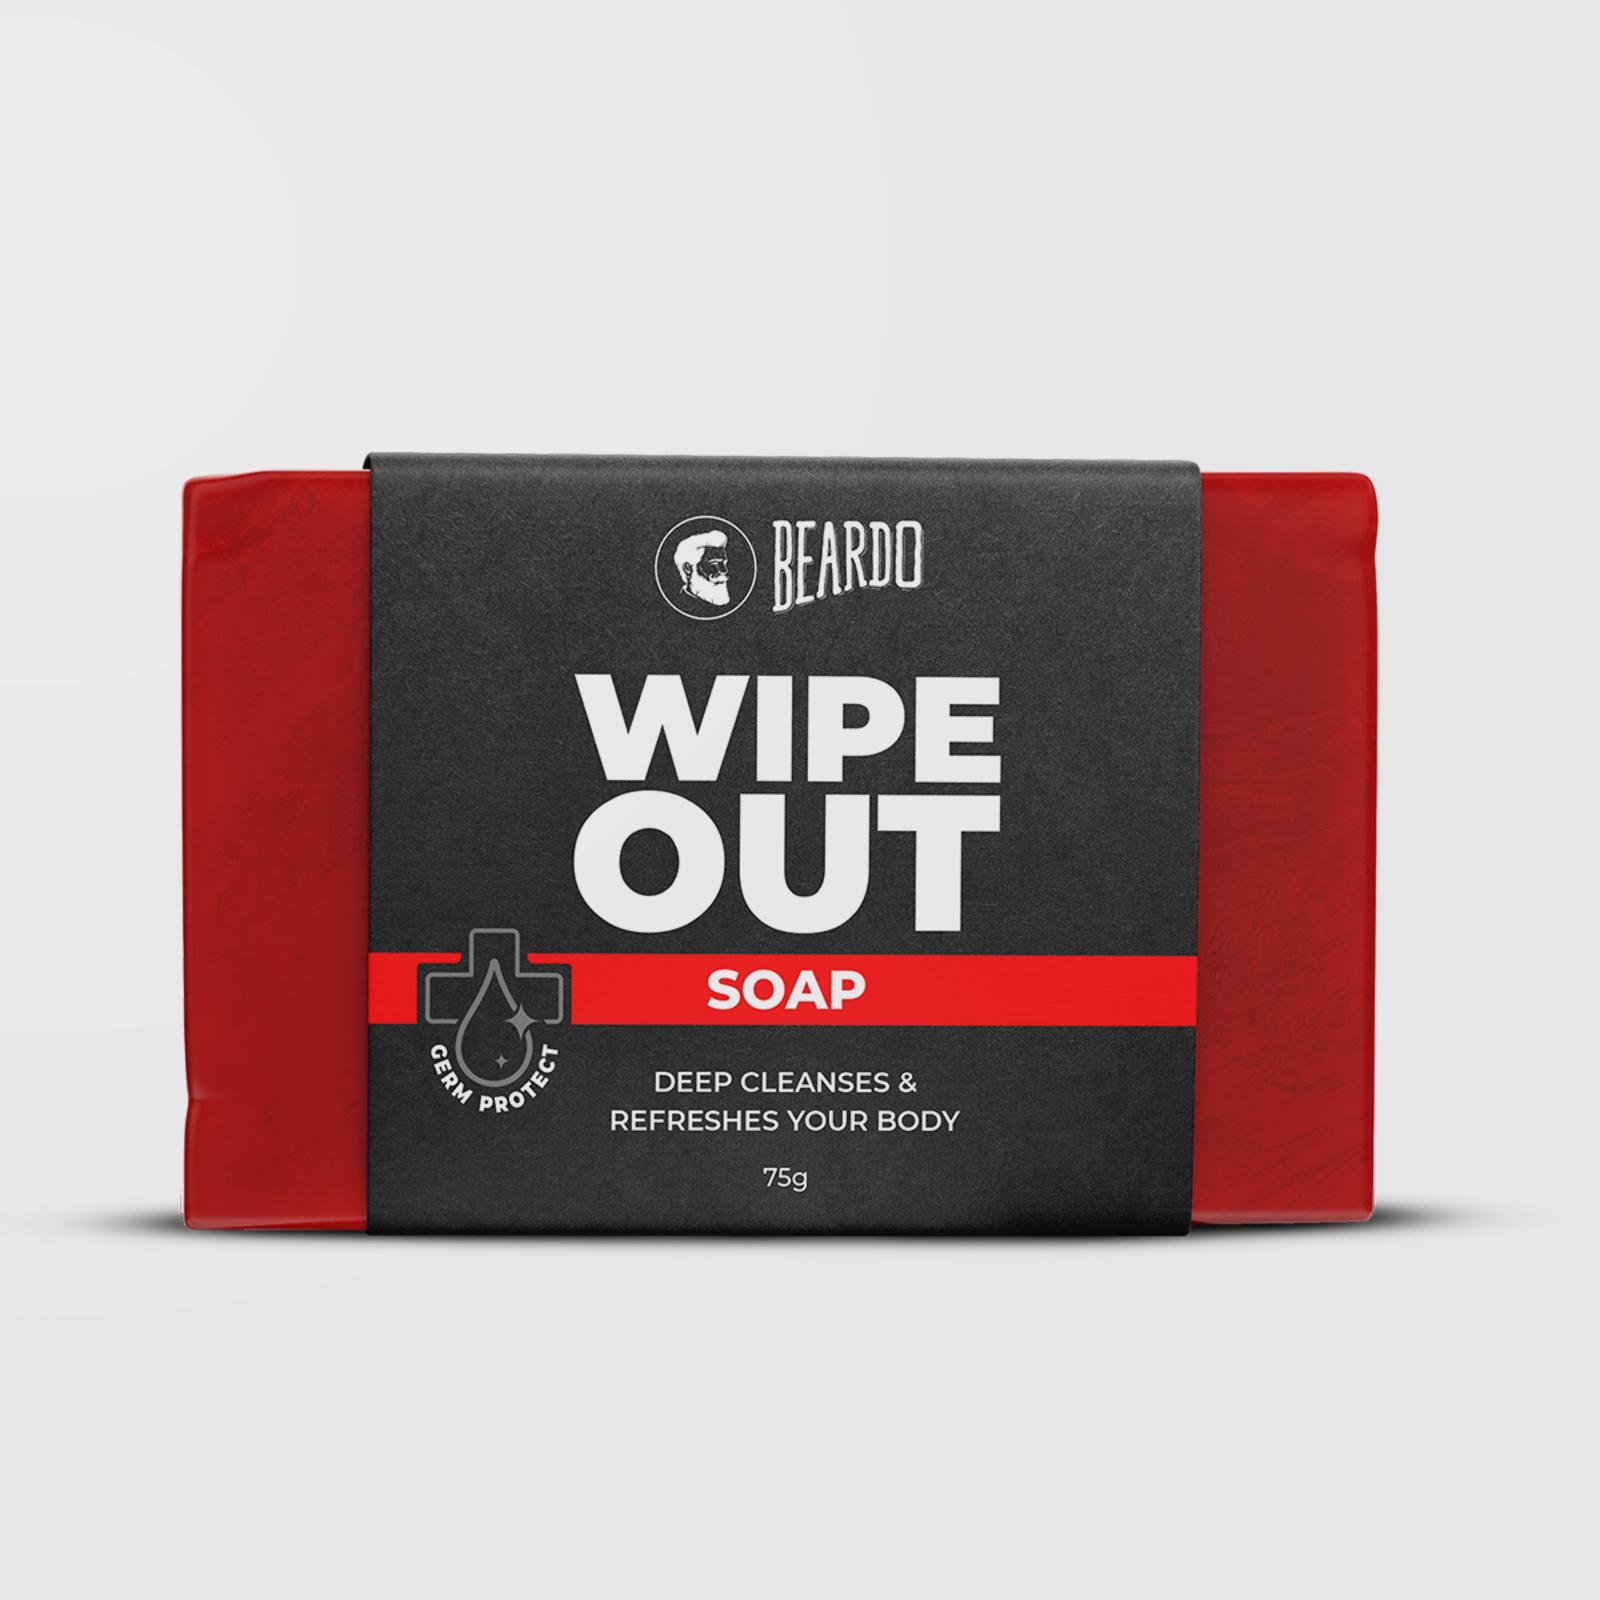 Beardo Wipeout Soap (Pack of 3)